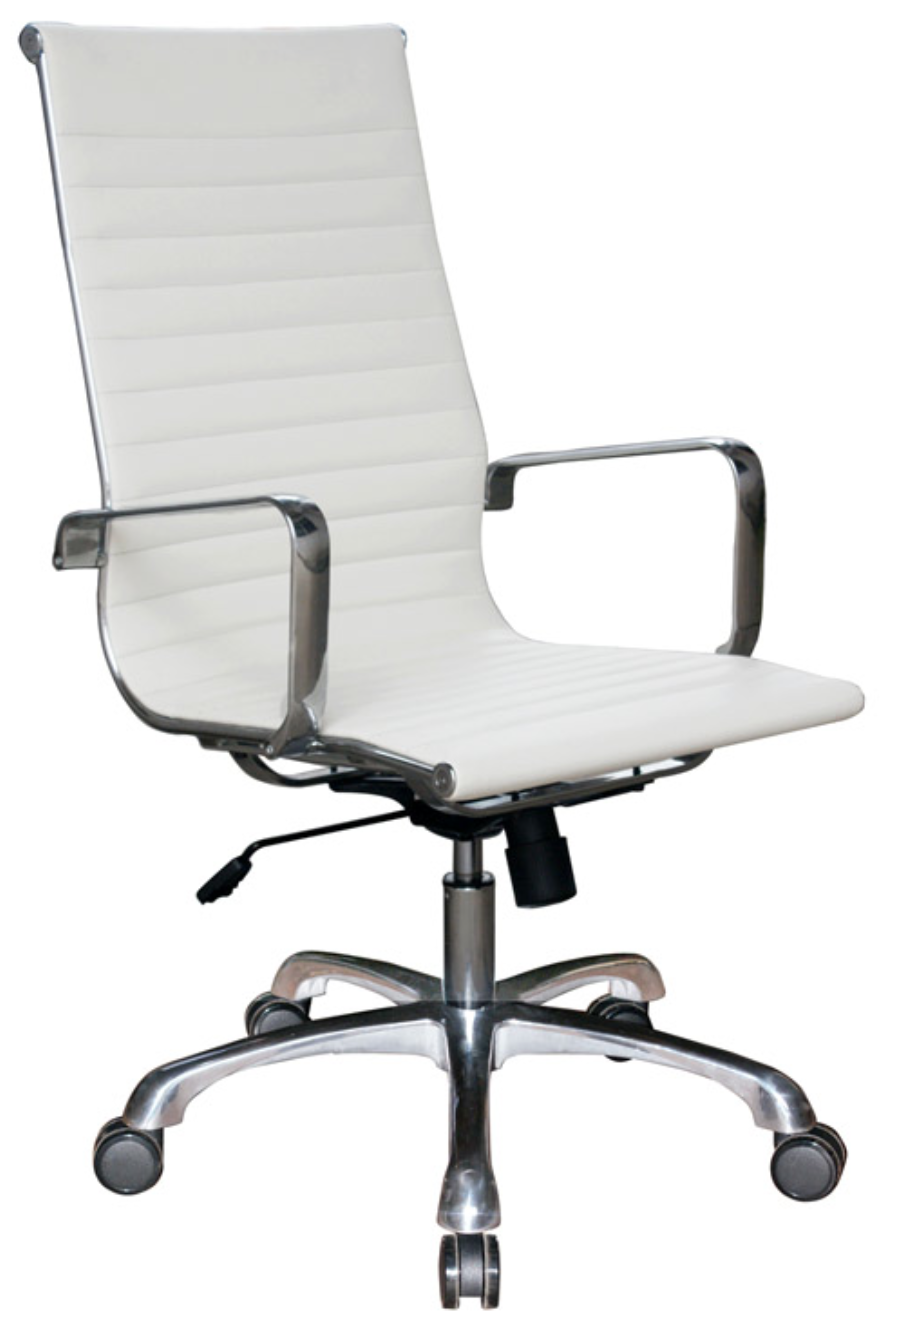 sleek office chairs. Talk About Chair. Sleek Office Chairs E